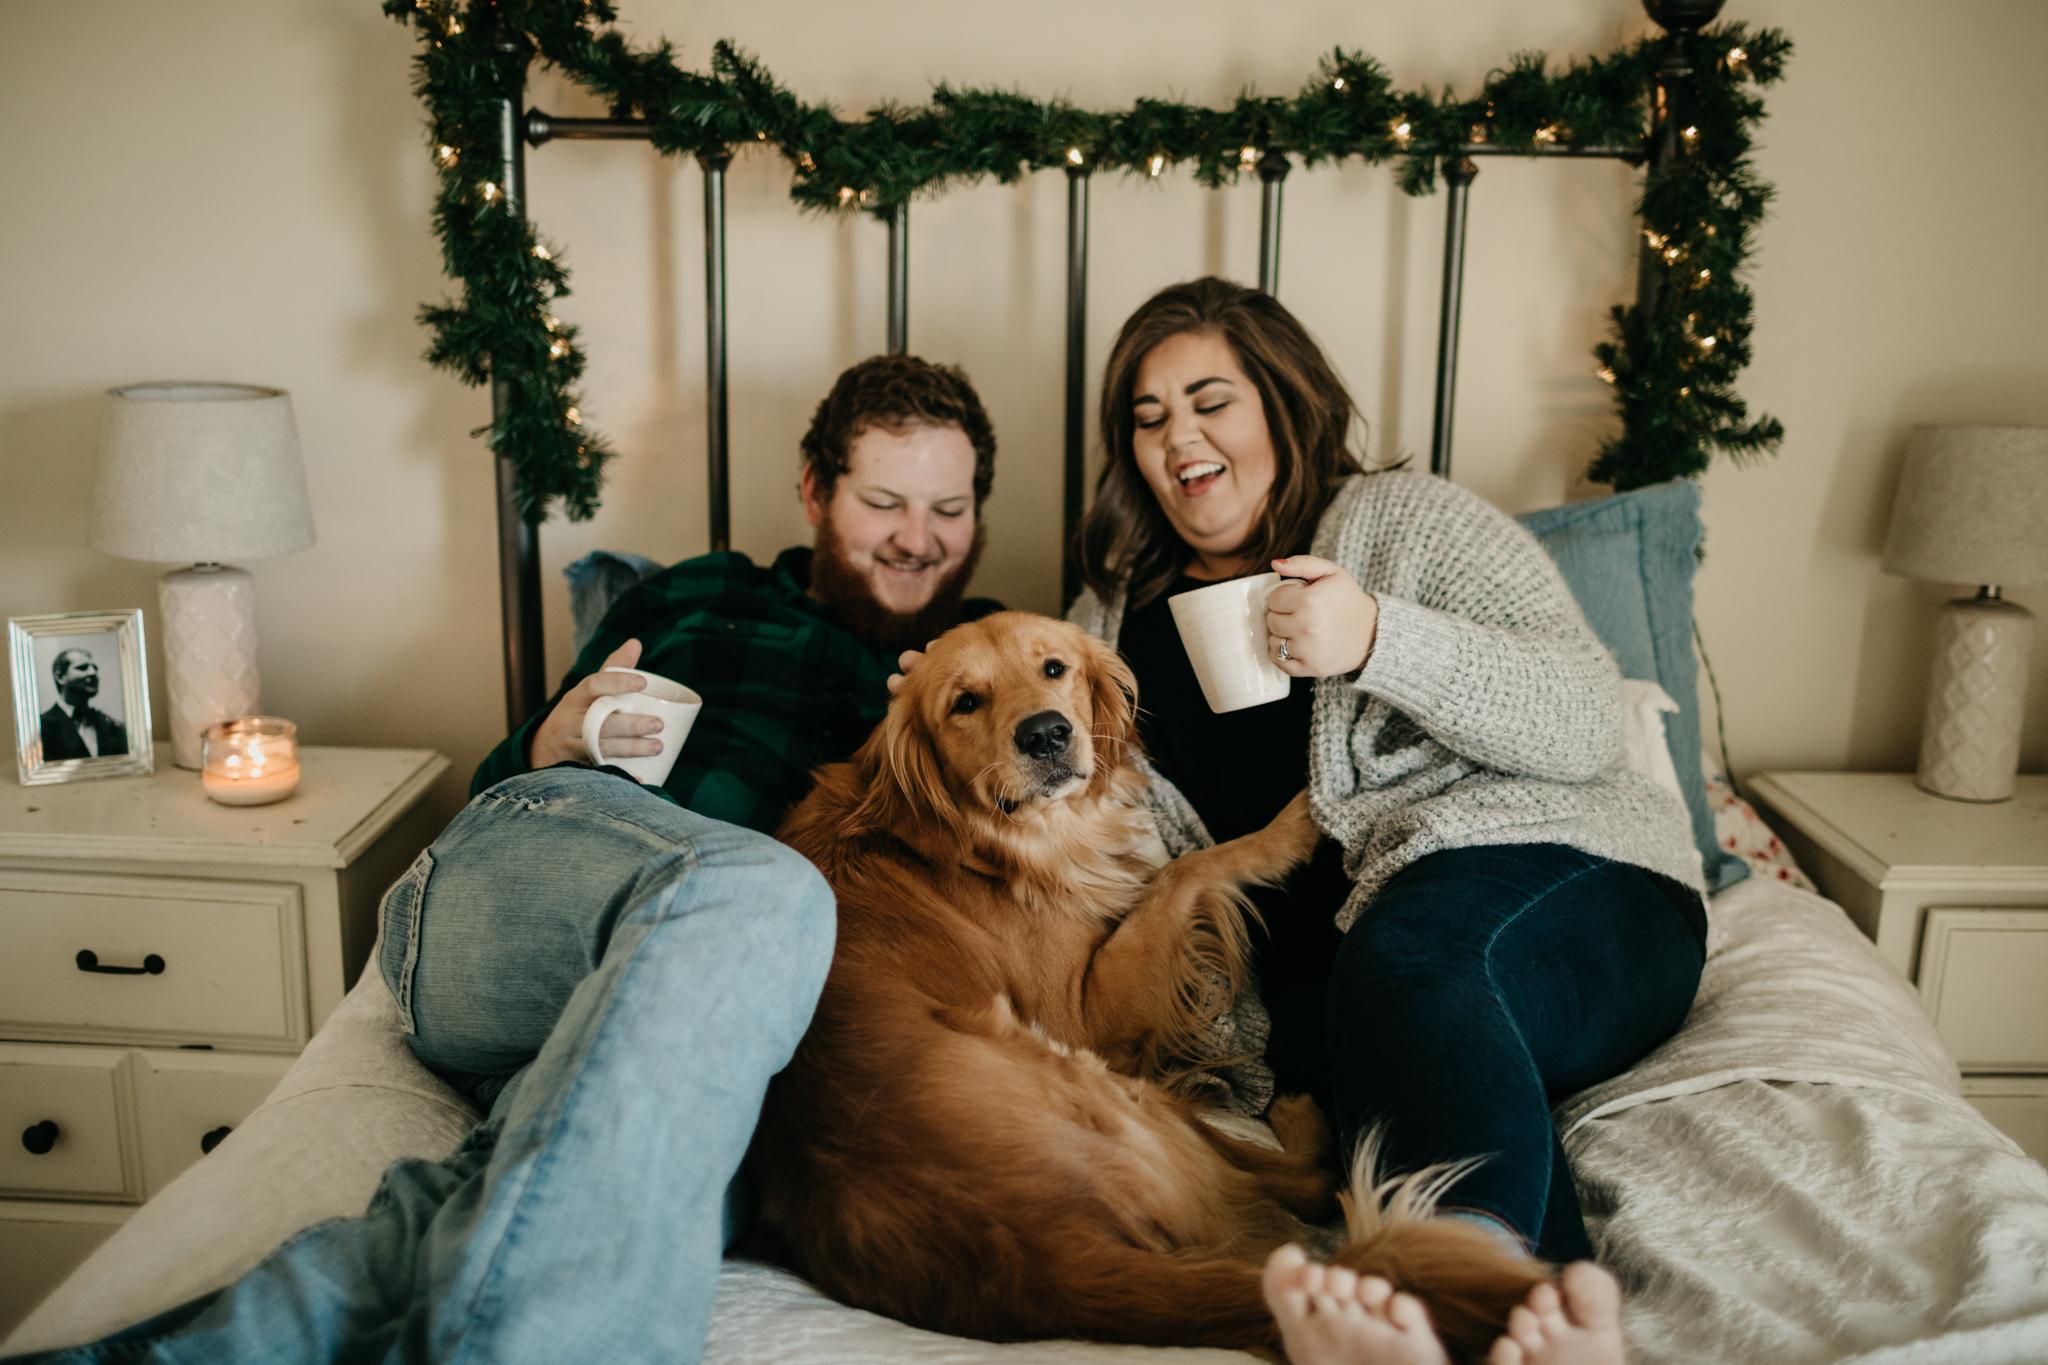 billie-shaye-style-photography-www.billieshayestyle.com-lifestyle-couple-christmas-cuddle-session-nashville-tennessee-8506.jpg